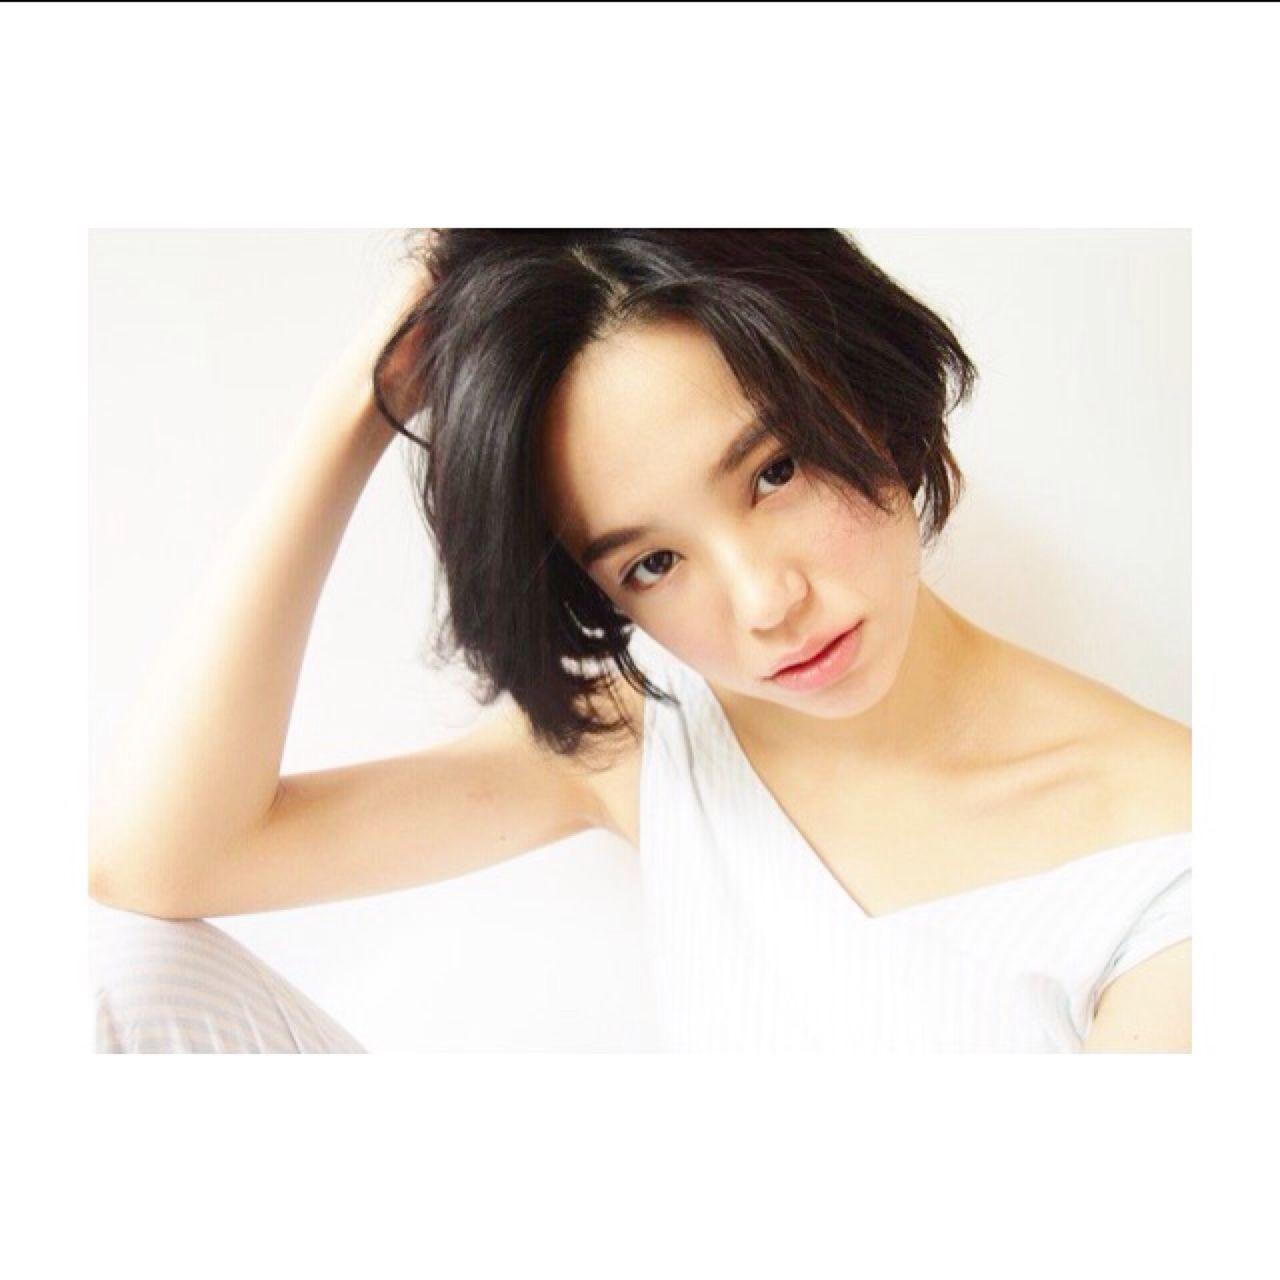 3b4e77cbf5045 ワンレンショートで叶える前髪なしの色っぽヘアスタイル♡ (HAIR) - LINE ...